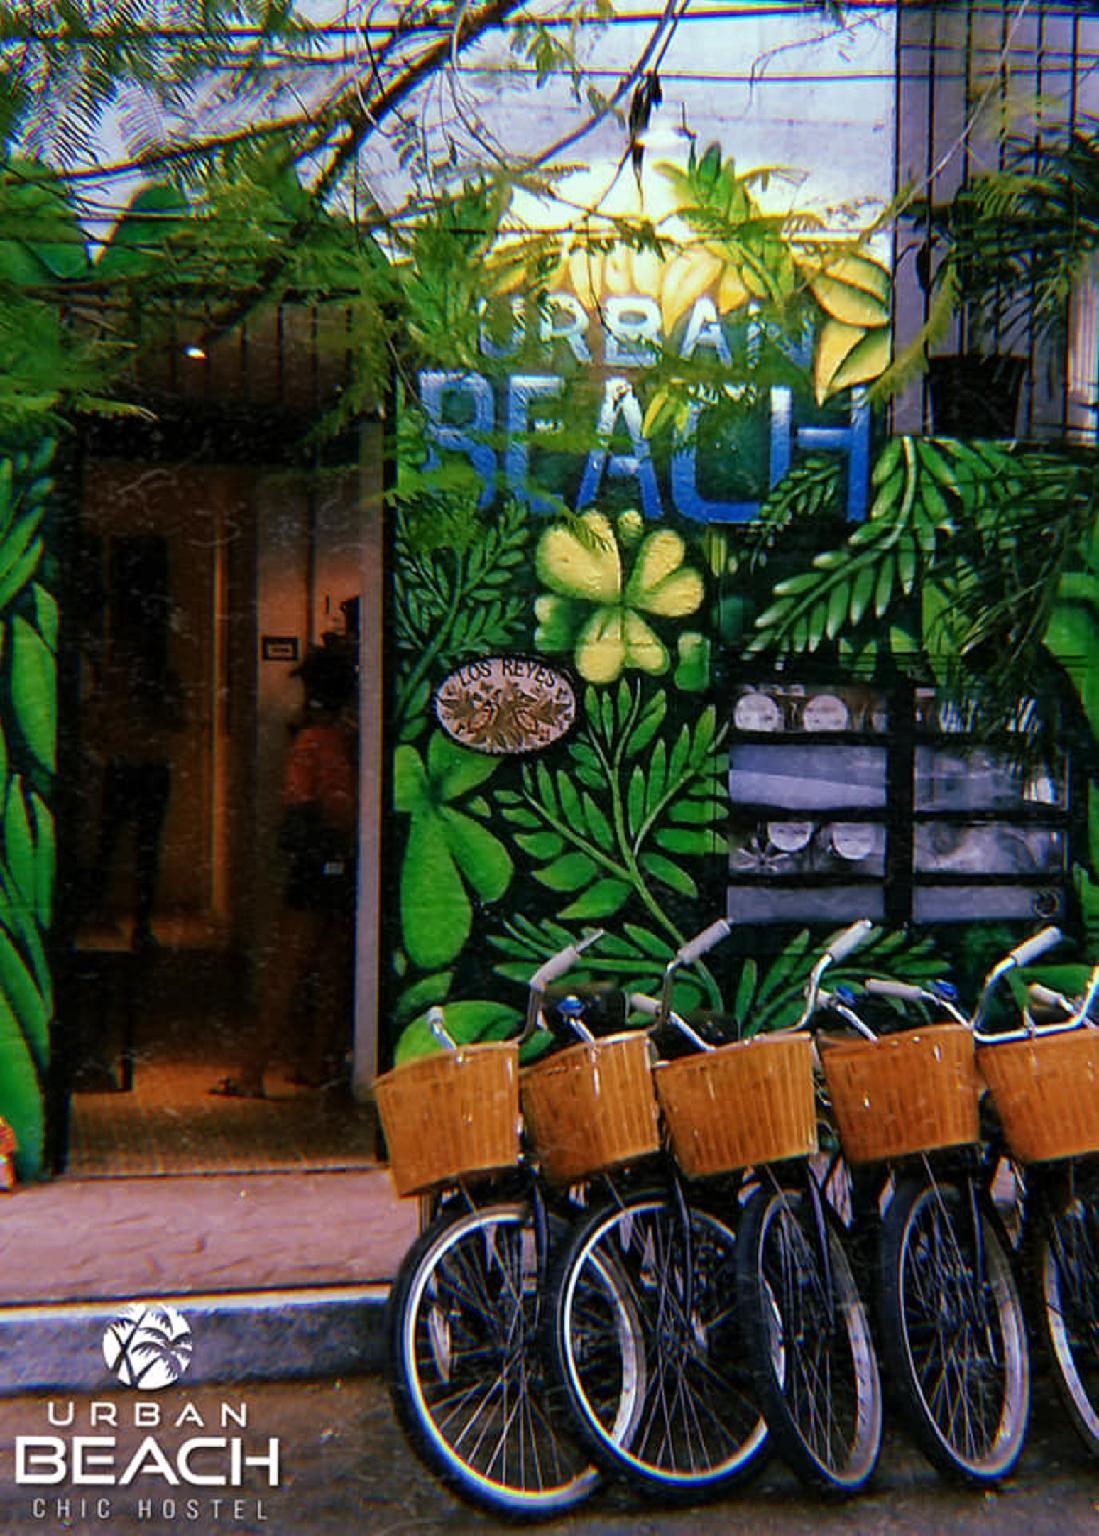 Urban Beach Chic Hostel